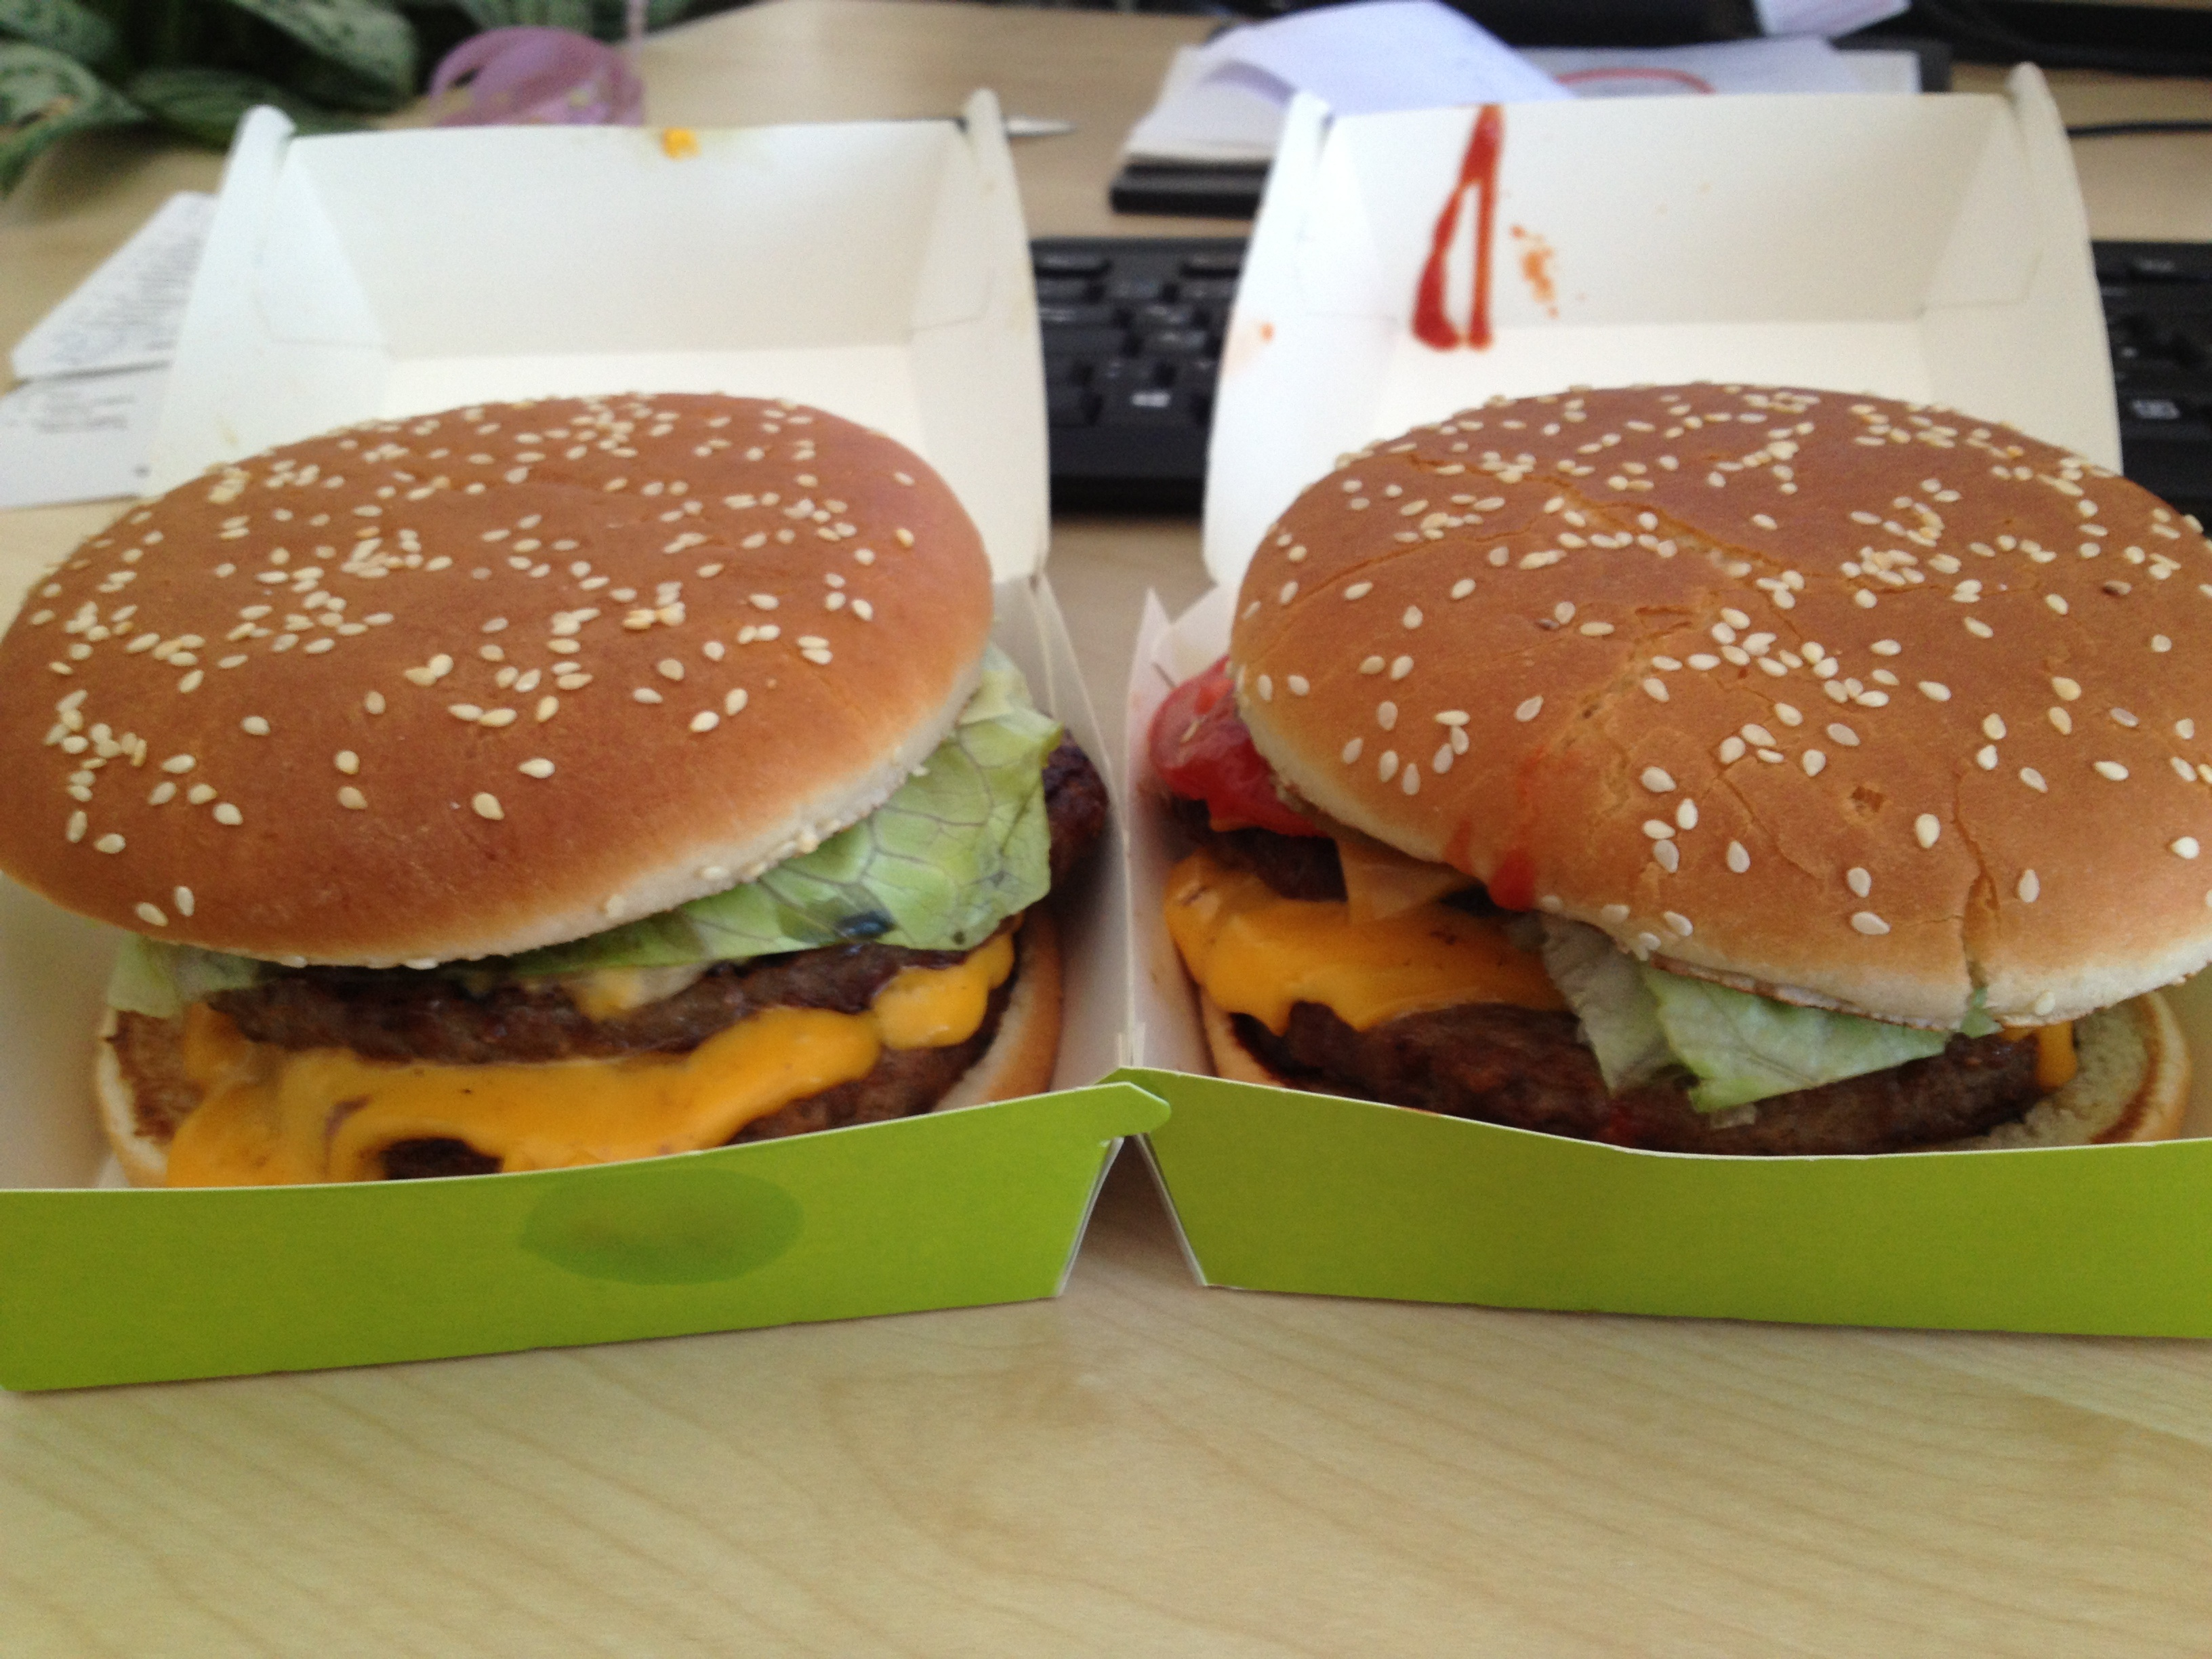 https://foodloader.net/BrollyLSSJ_2013-08-02_burgerme_-_2_DoubleMe_Cheeseburger.jpg